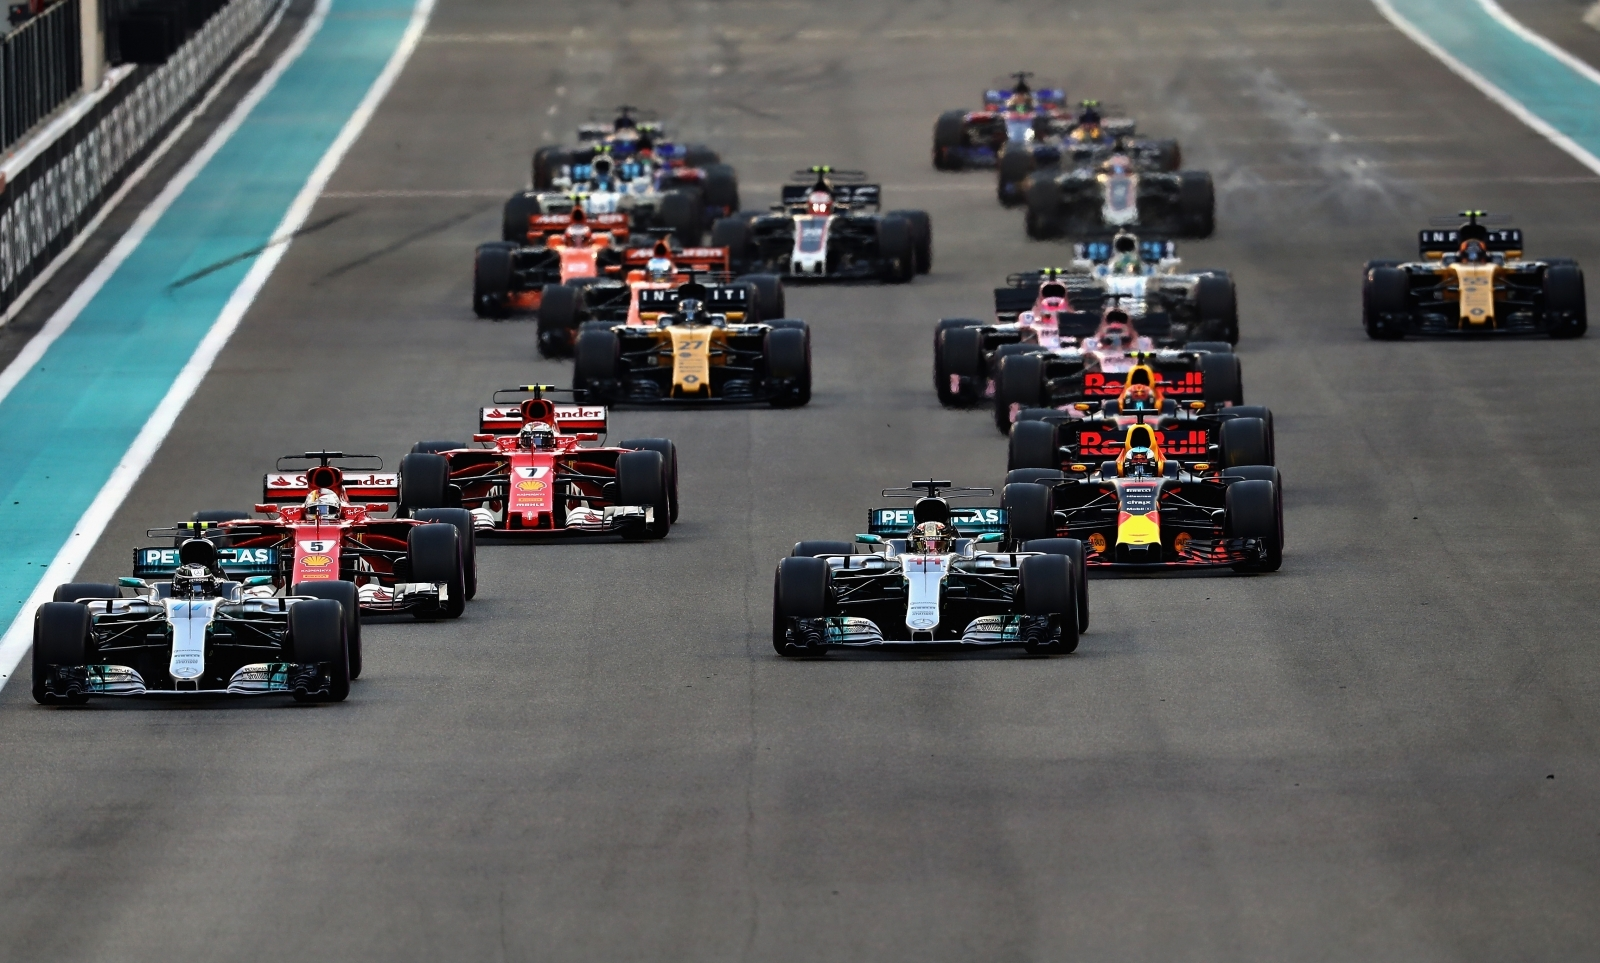 Racing Calendar June : Fia releases formula race calendar with historic